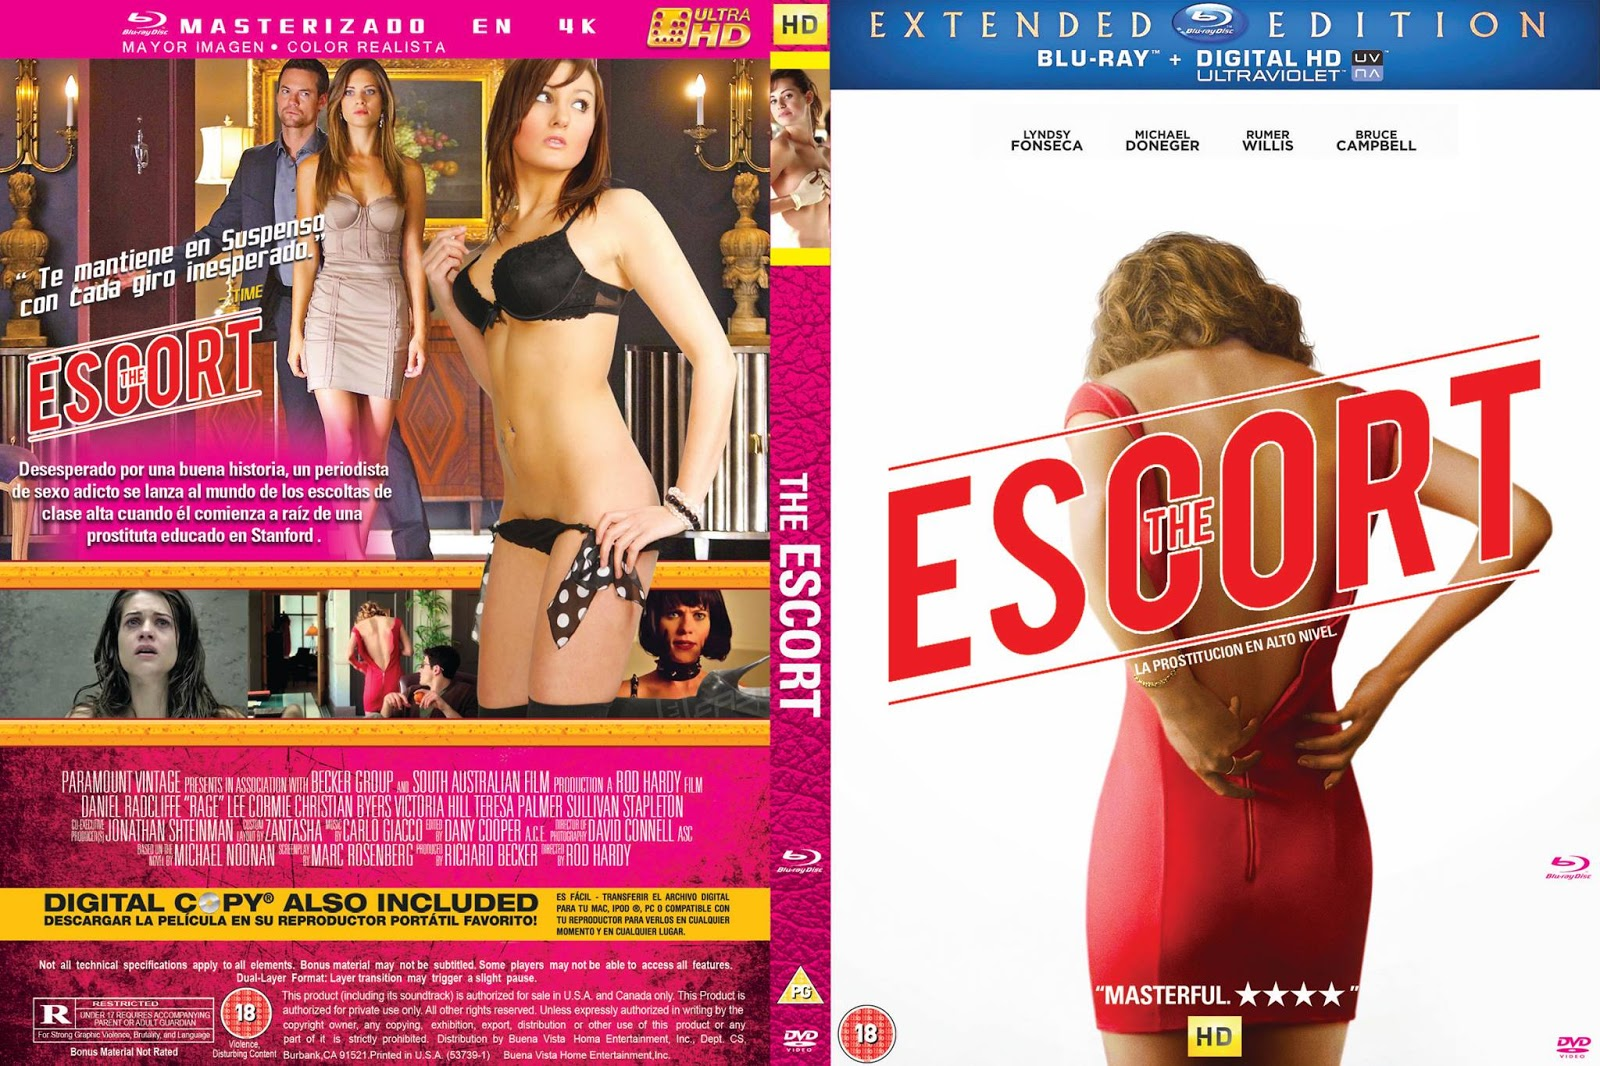 dansk escort video porno sviger